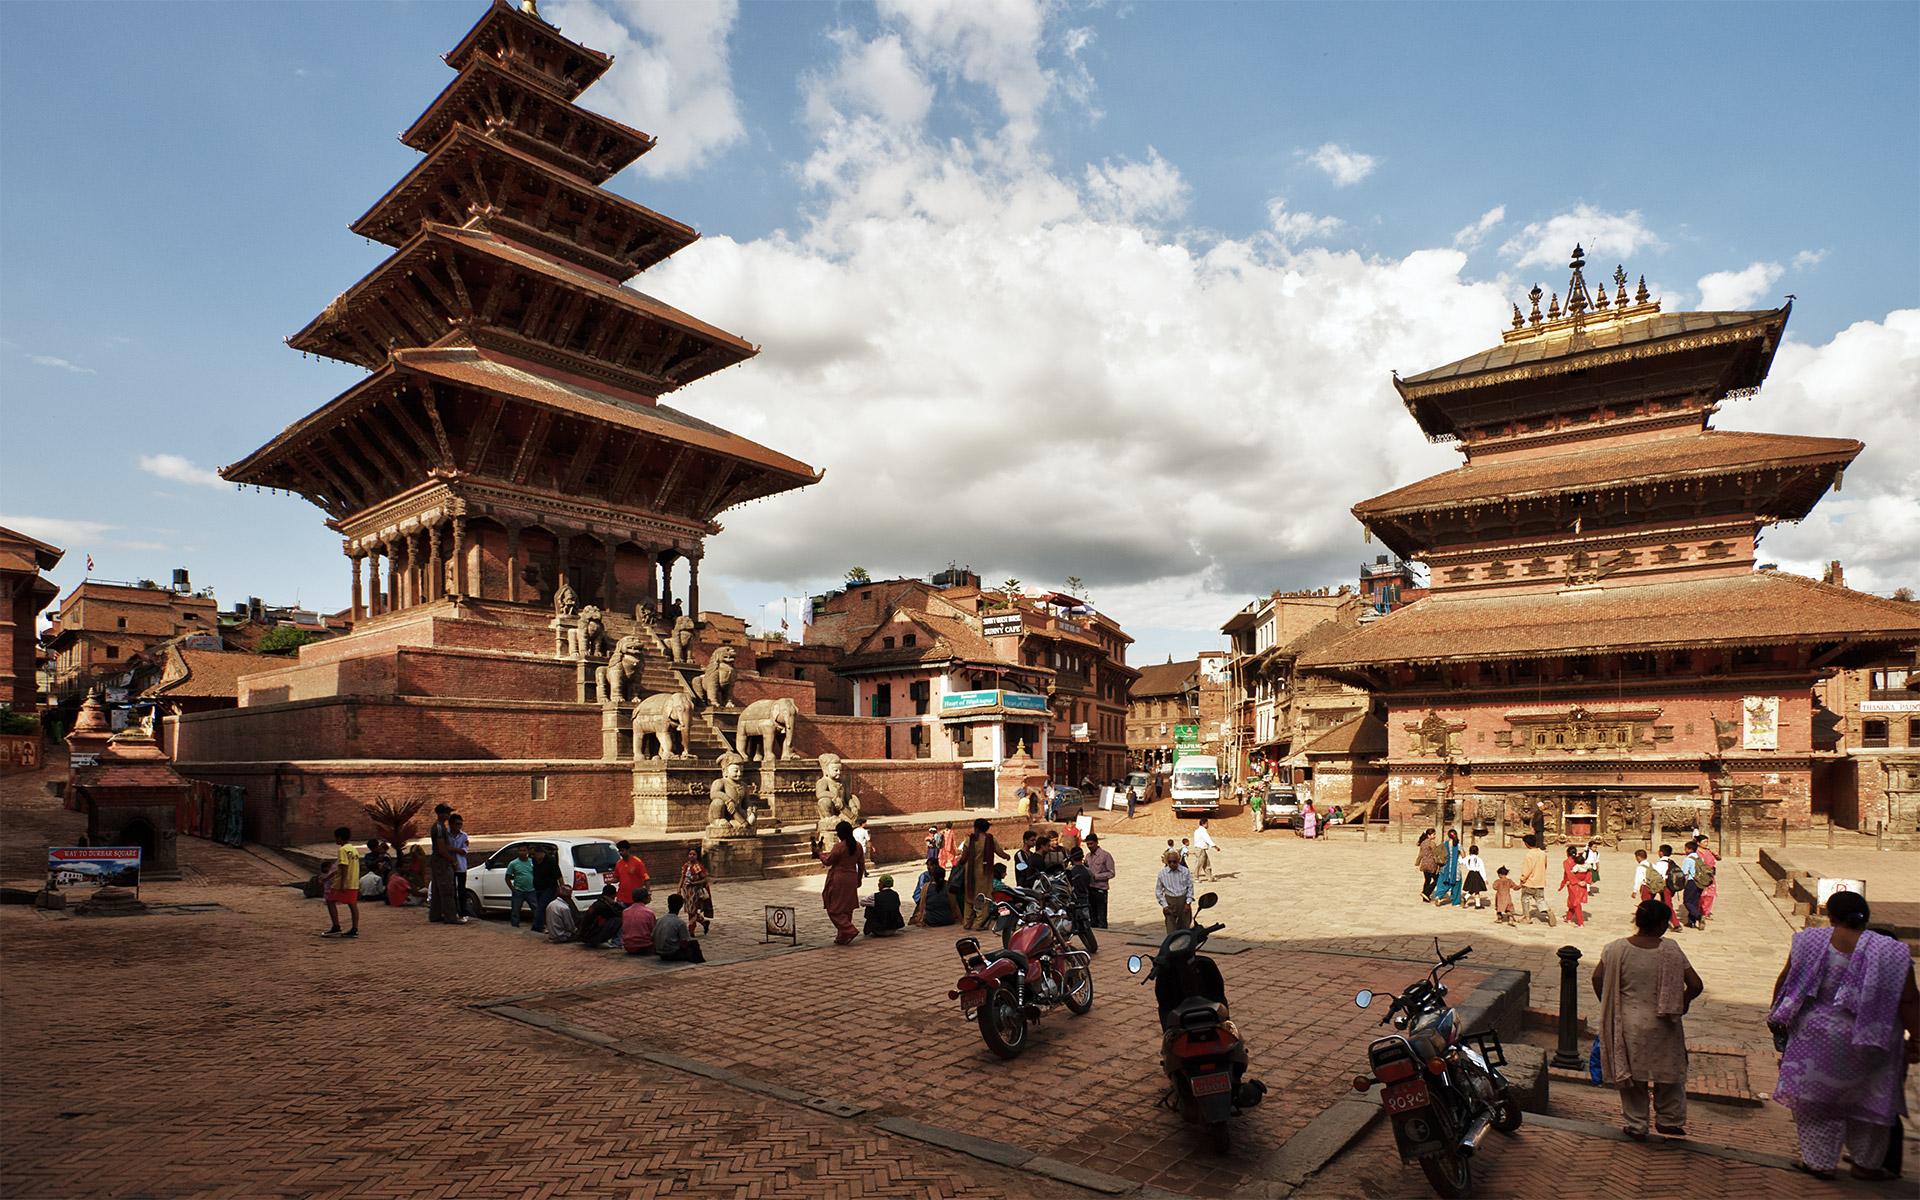 Nepal_Bhaktapur_70-1457080332.jpg